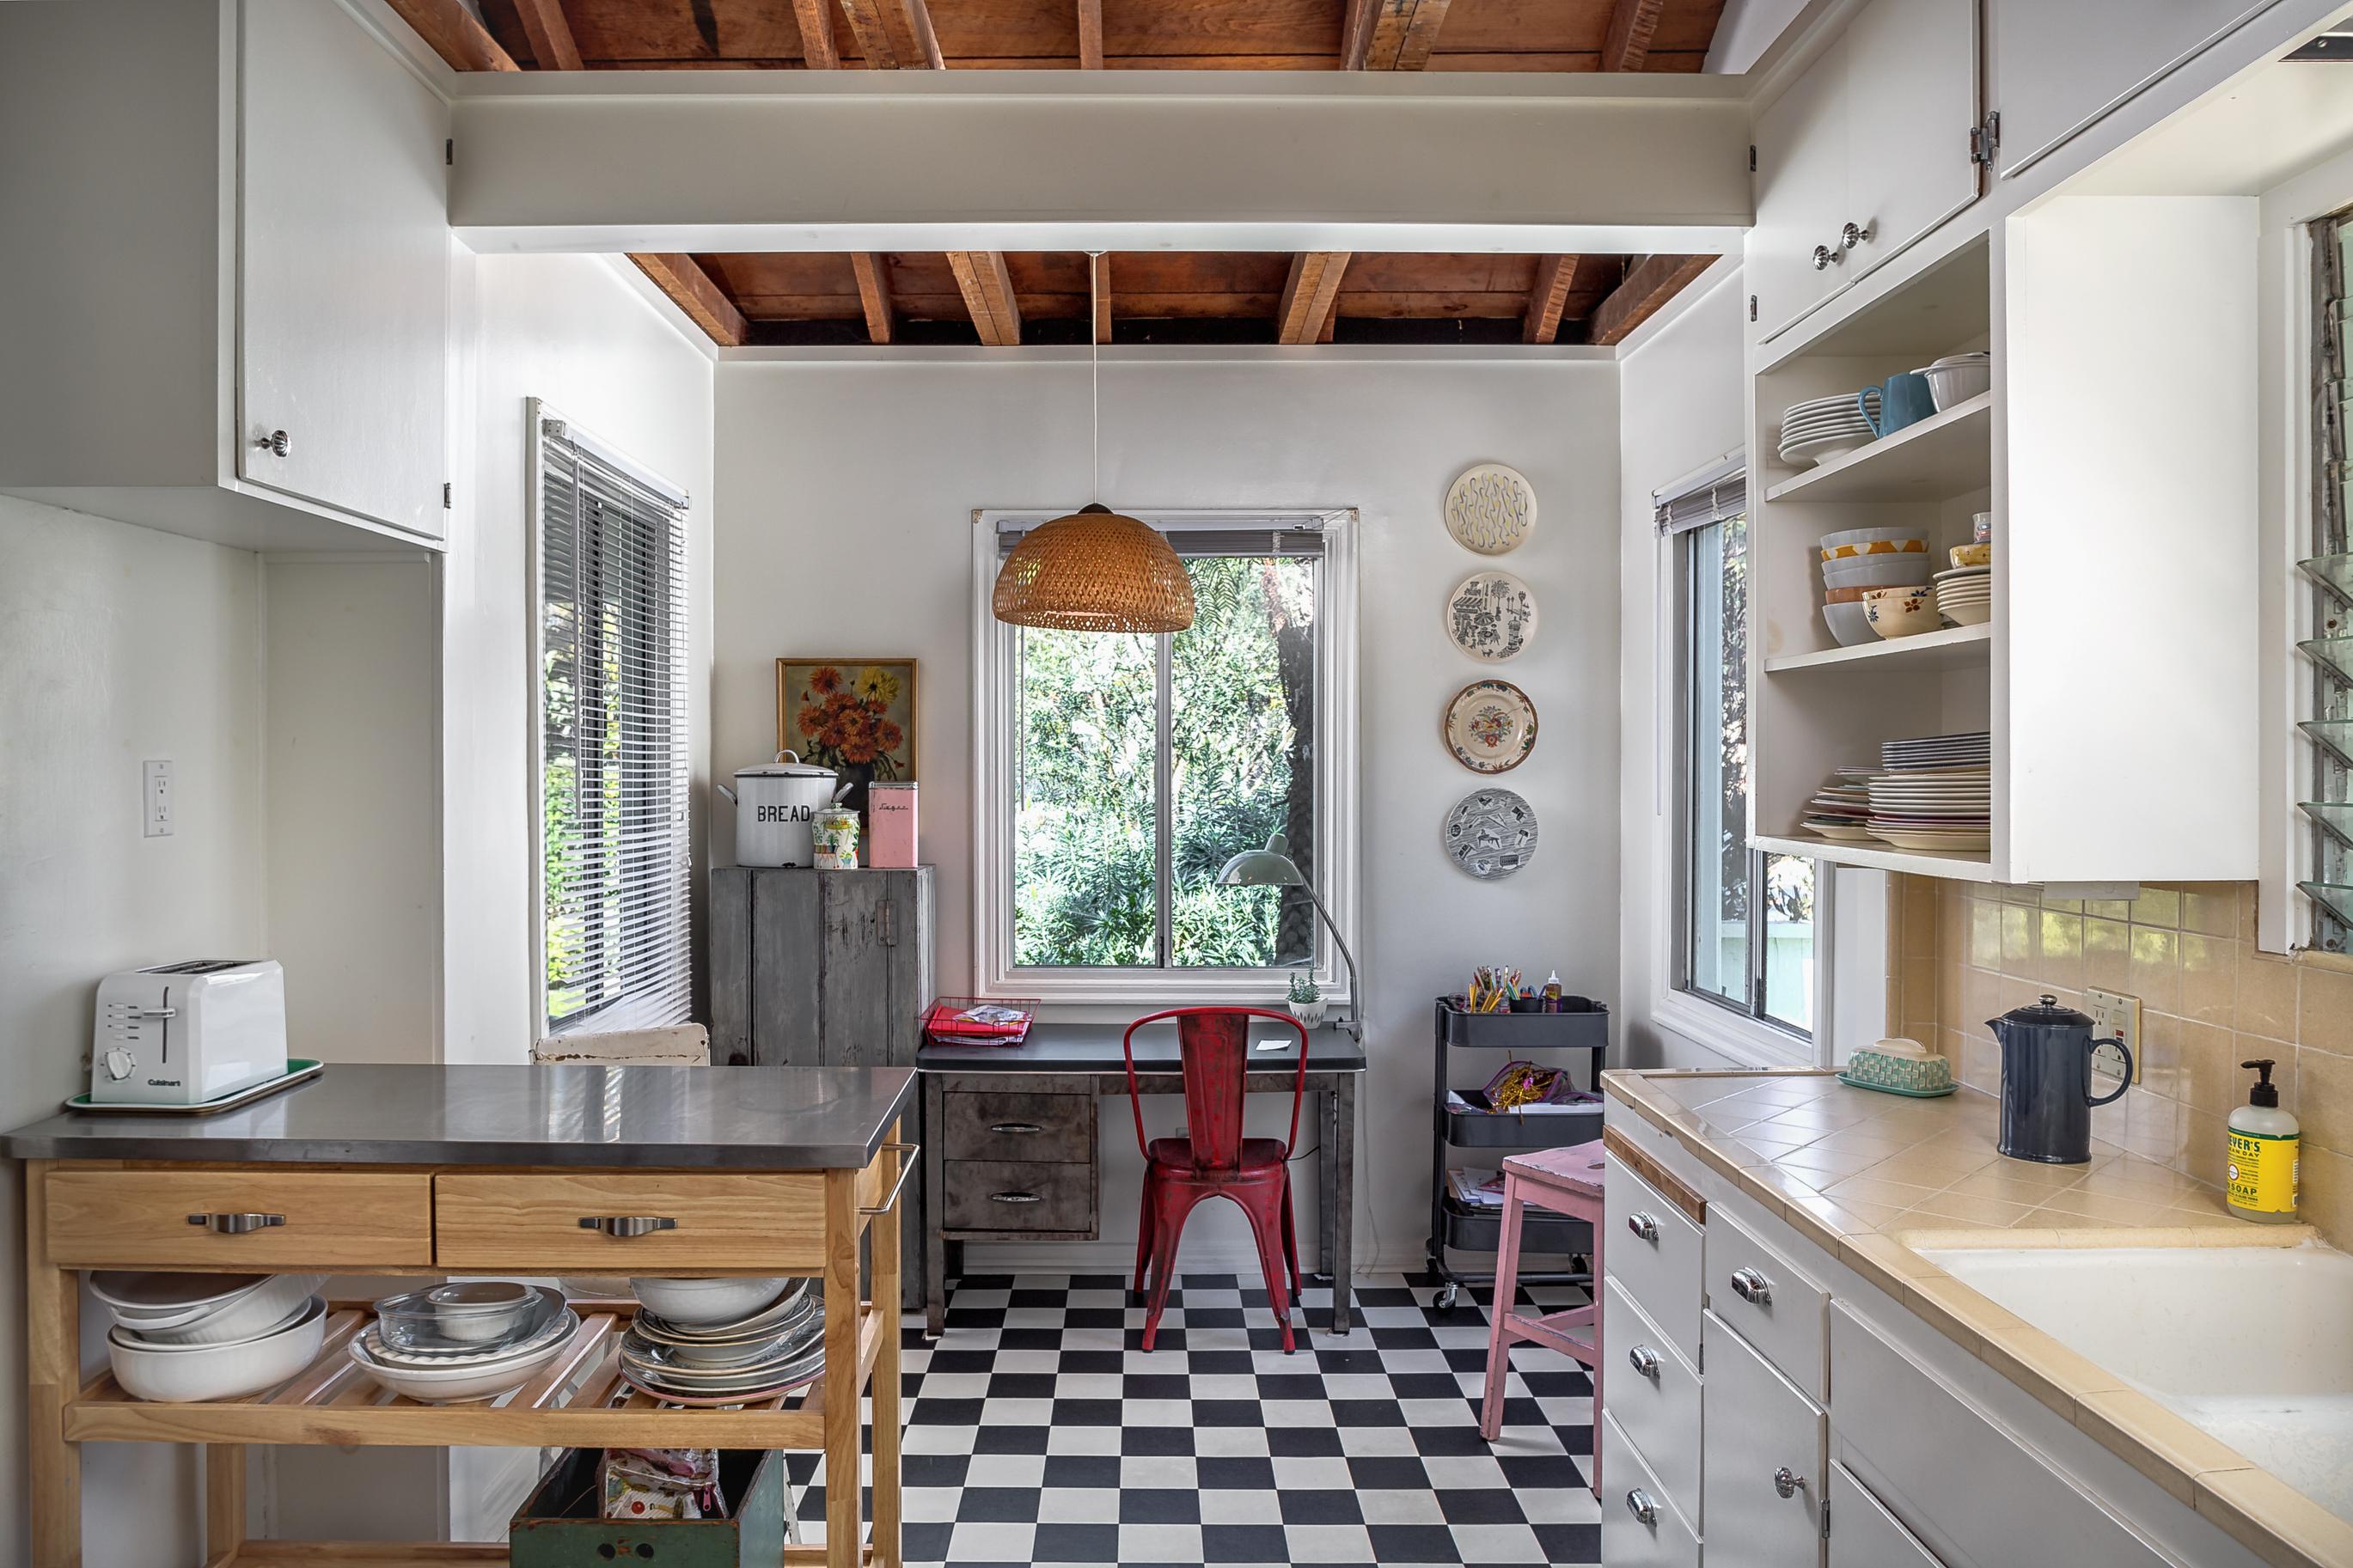 darling santa monica cottage asks $2.149m - curbed la